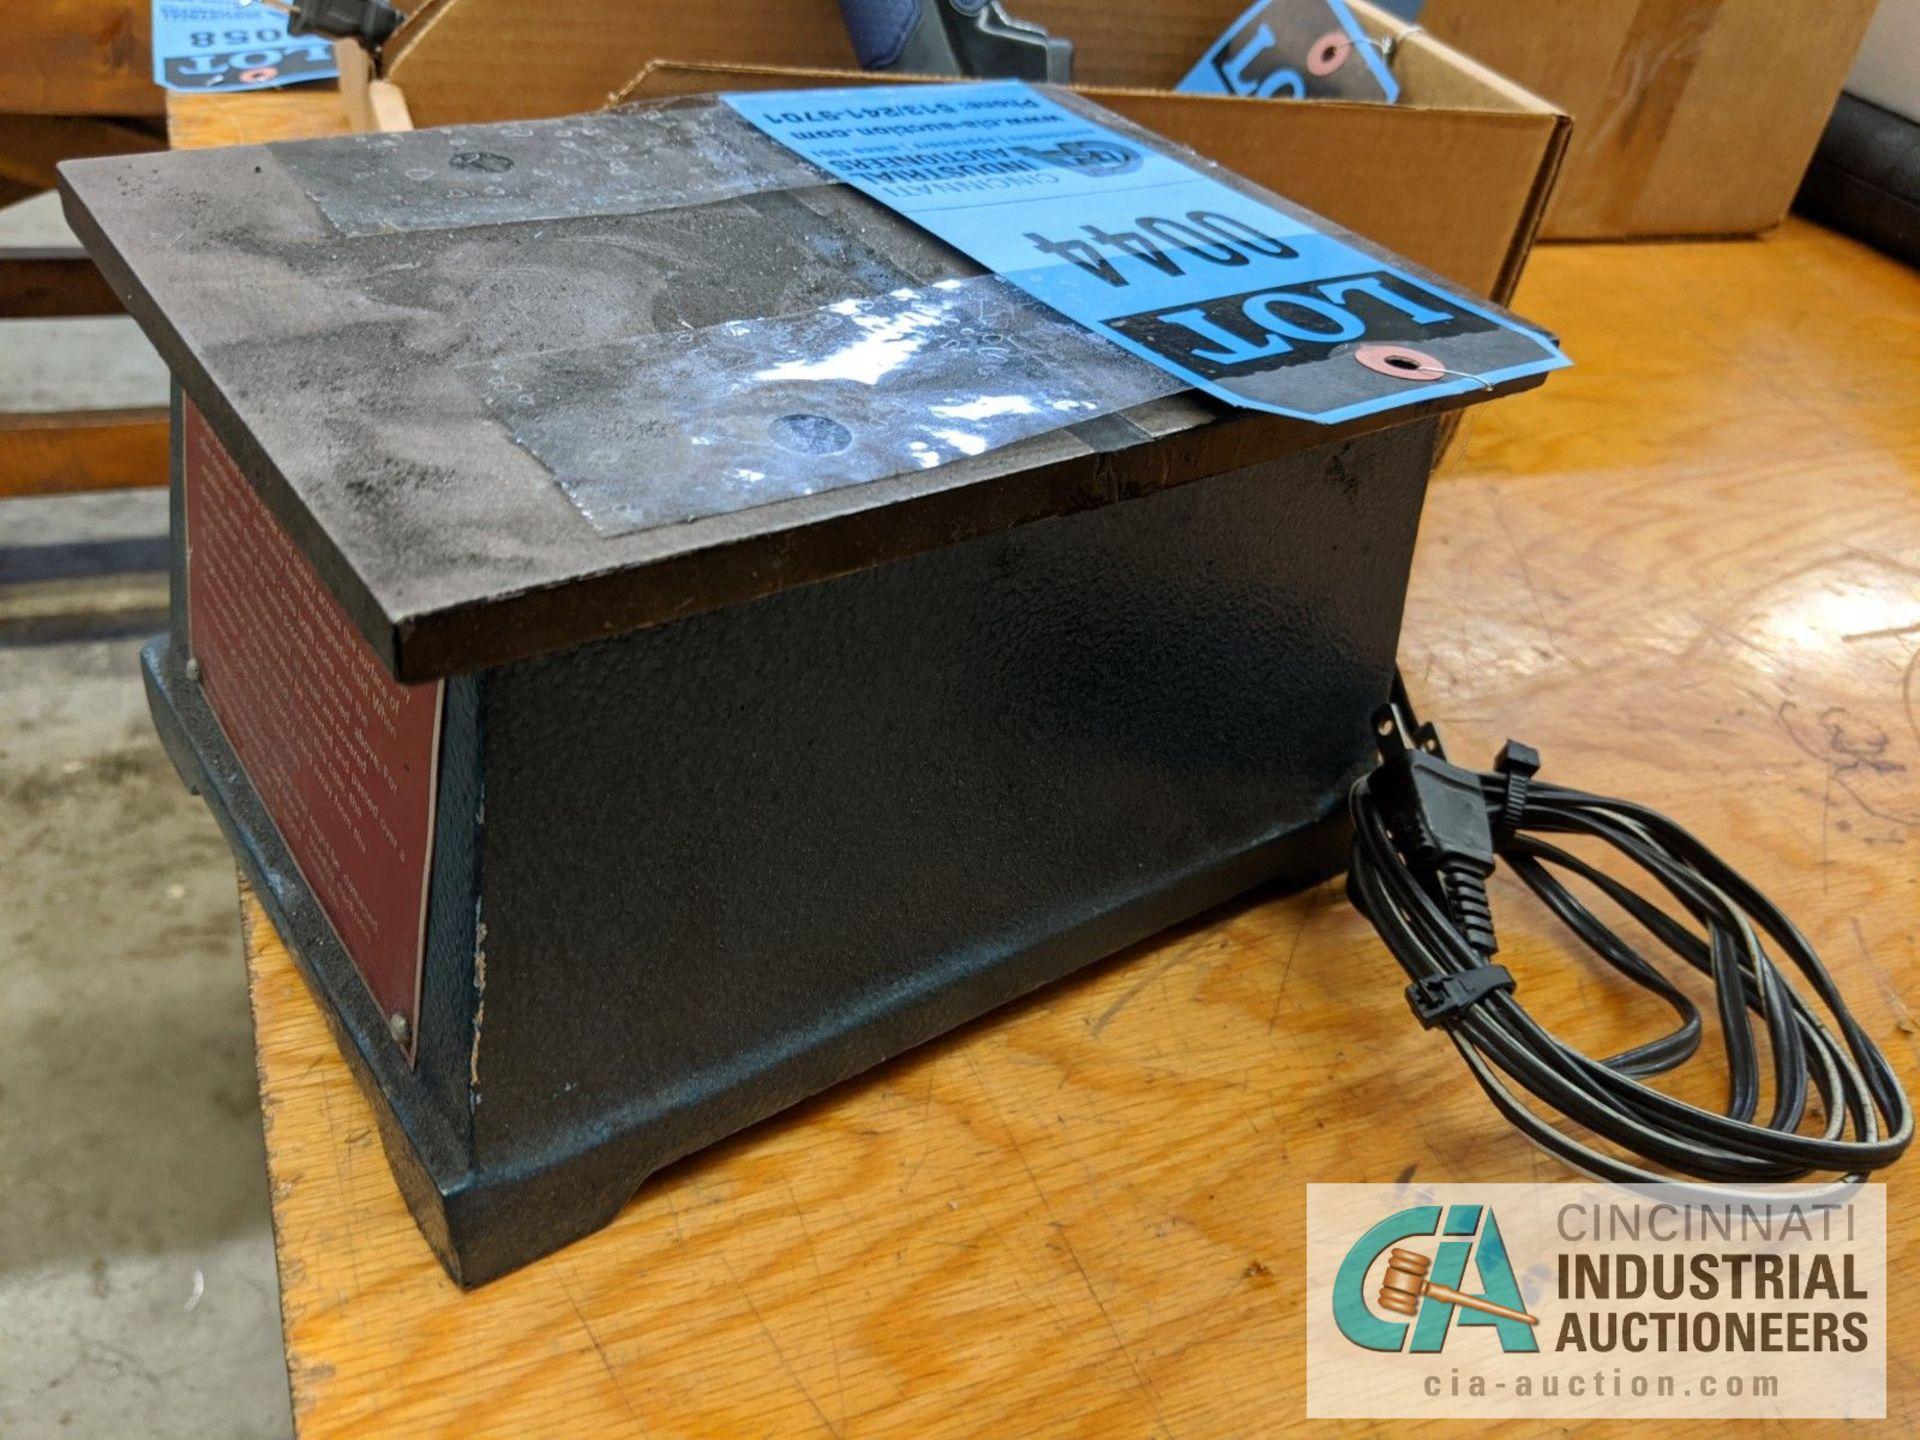 ENCO MODEL 285-2515 DEMAG UNIT - Image 3 of 3